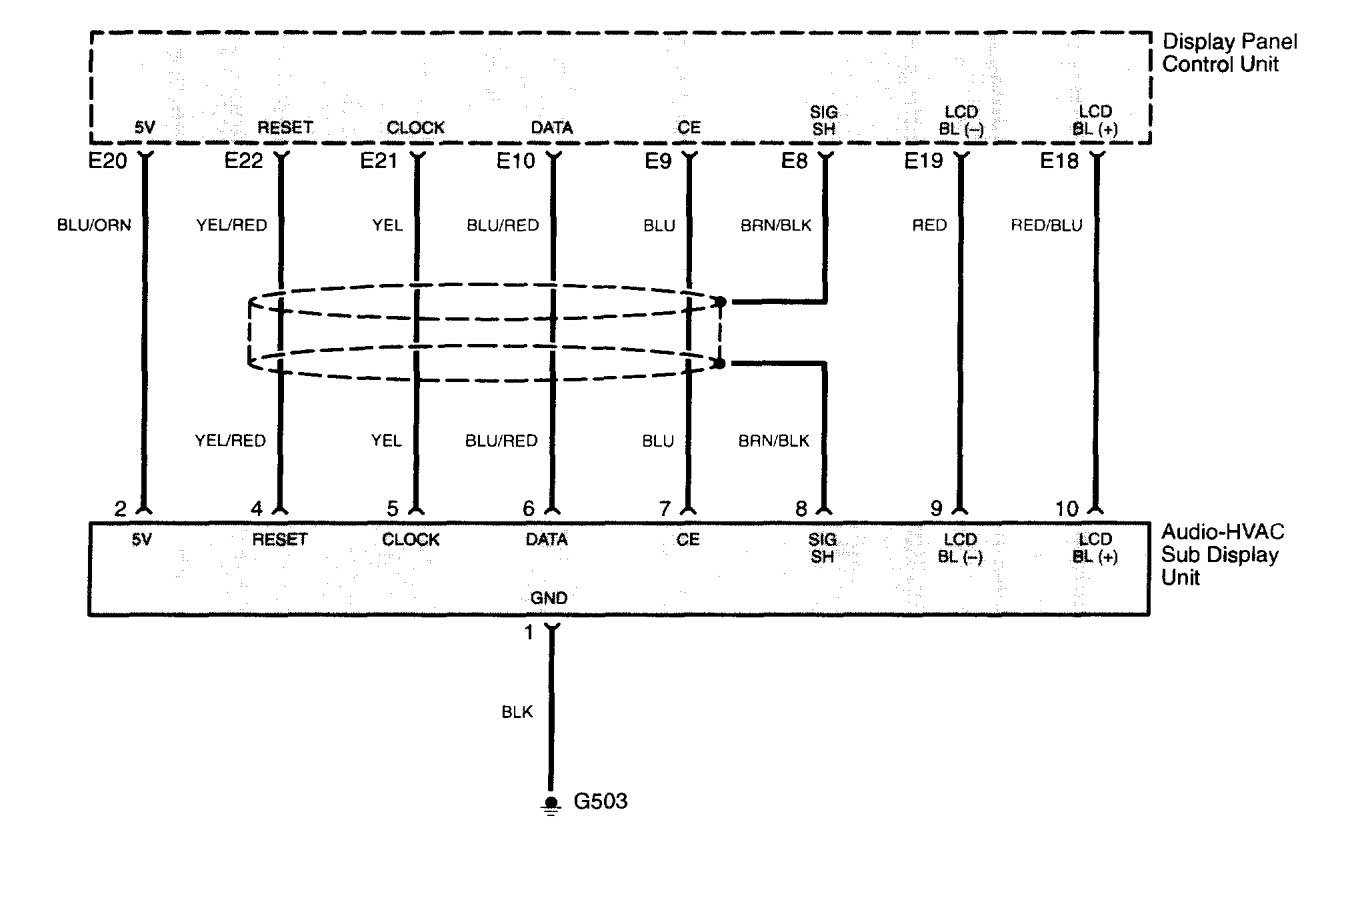 Acura Tl  2006  - Wiring Diagram